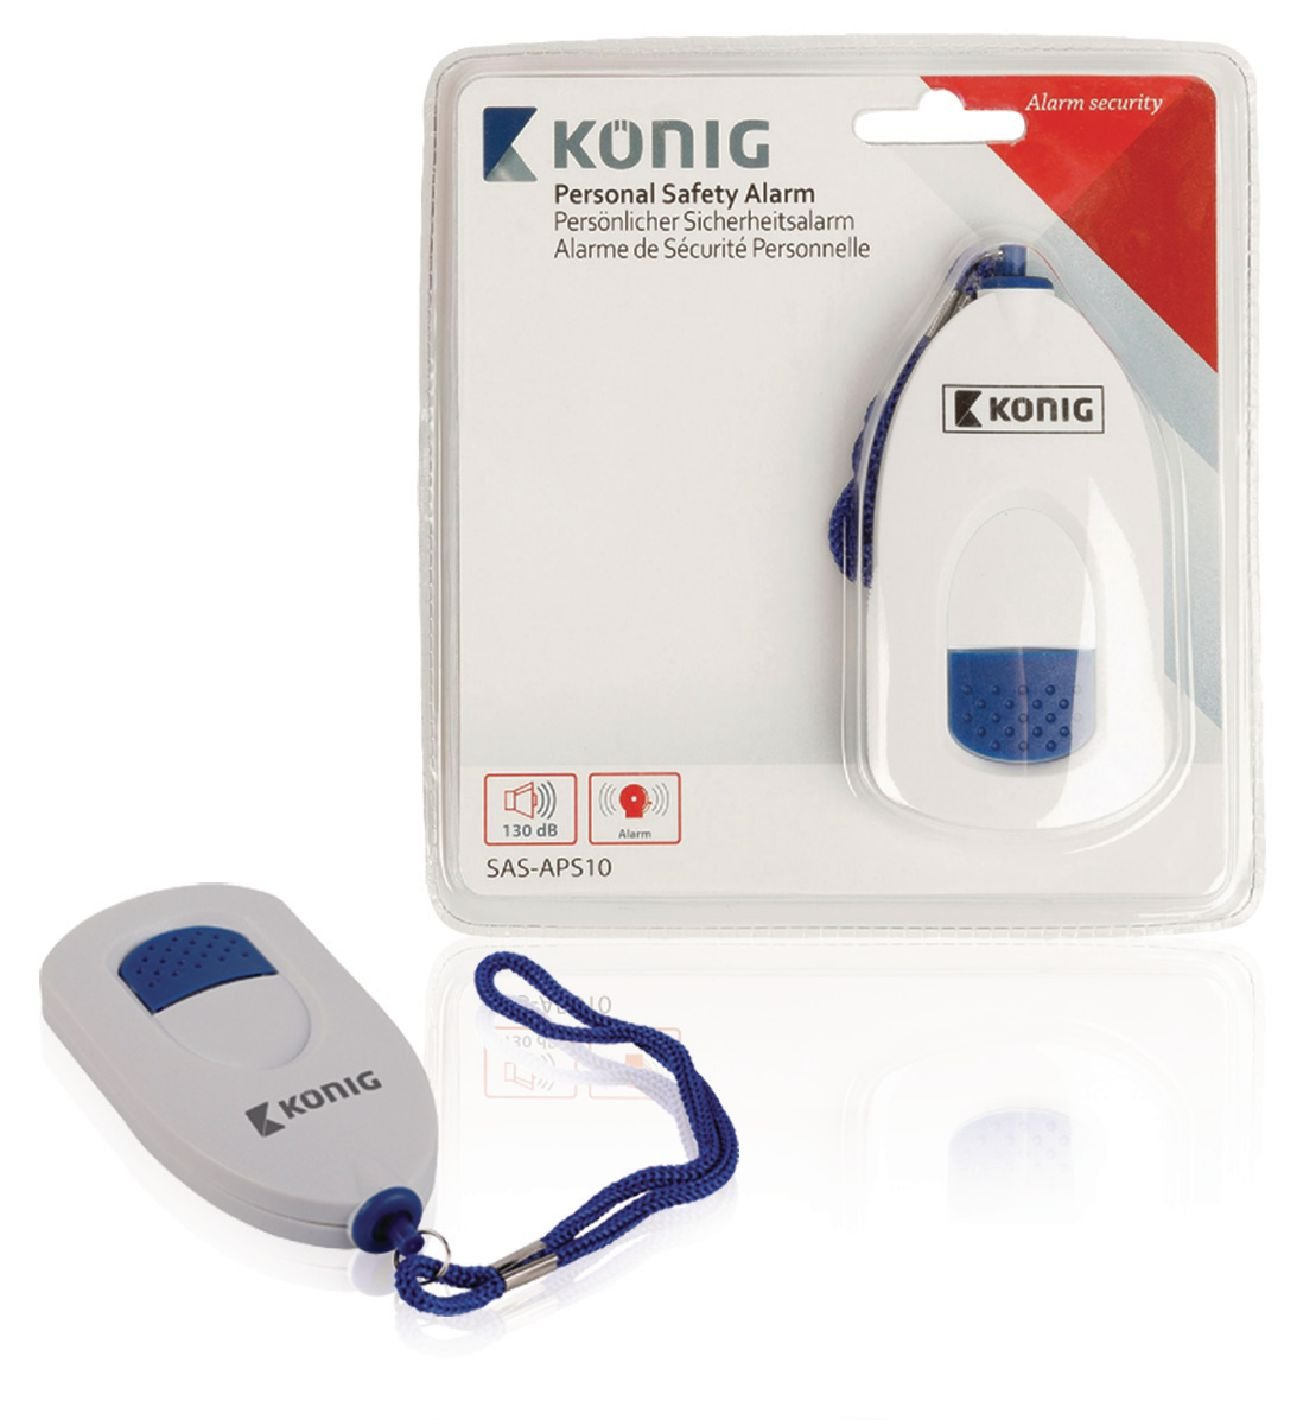 Eurosell 2 St/ück Handalarmger/ät Handtaschen Sirene Panik Alarm Sicherheit Safety Button